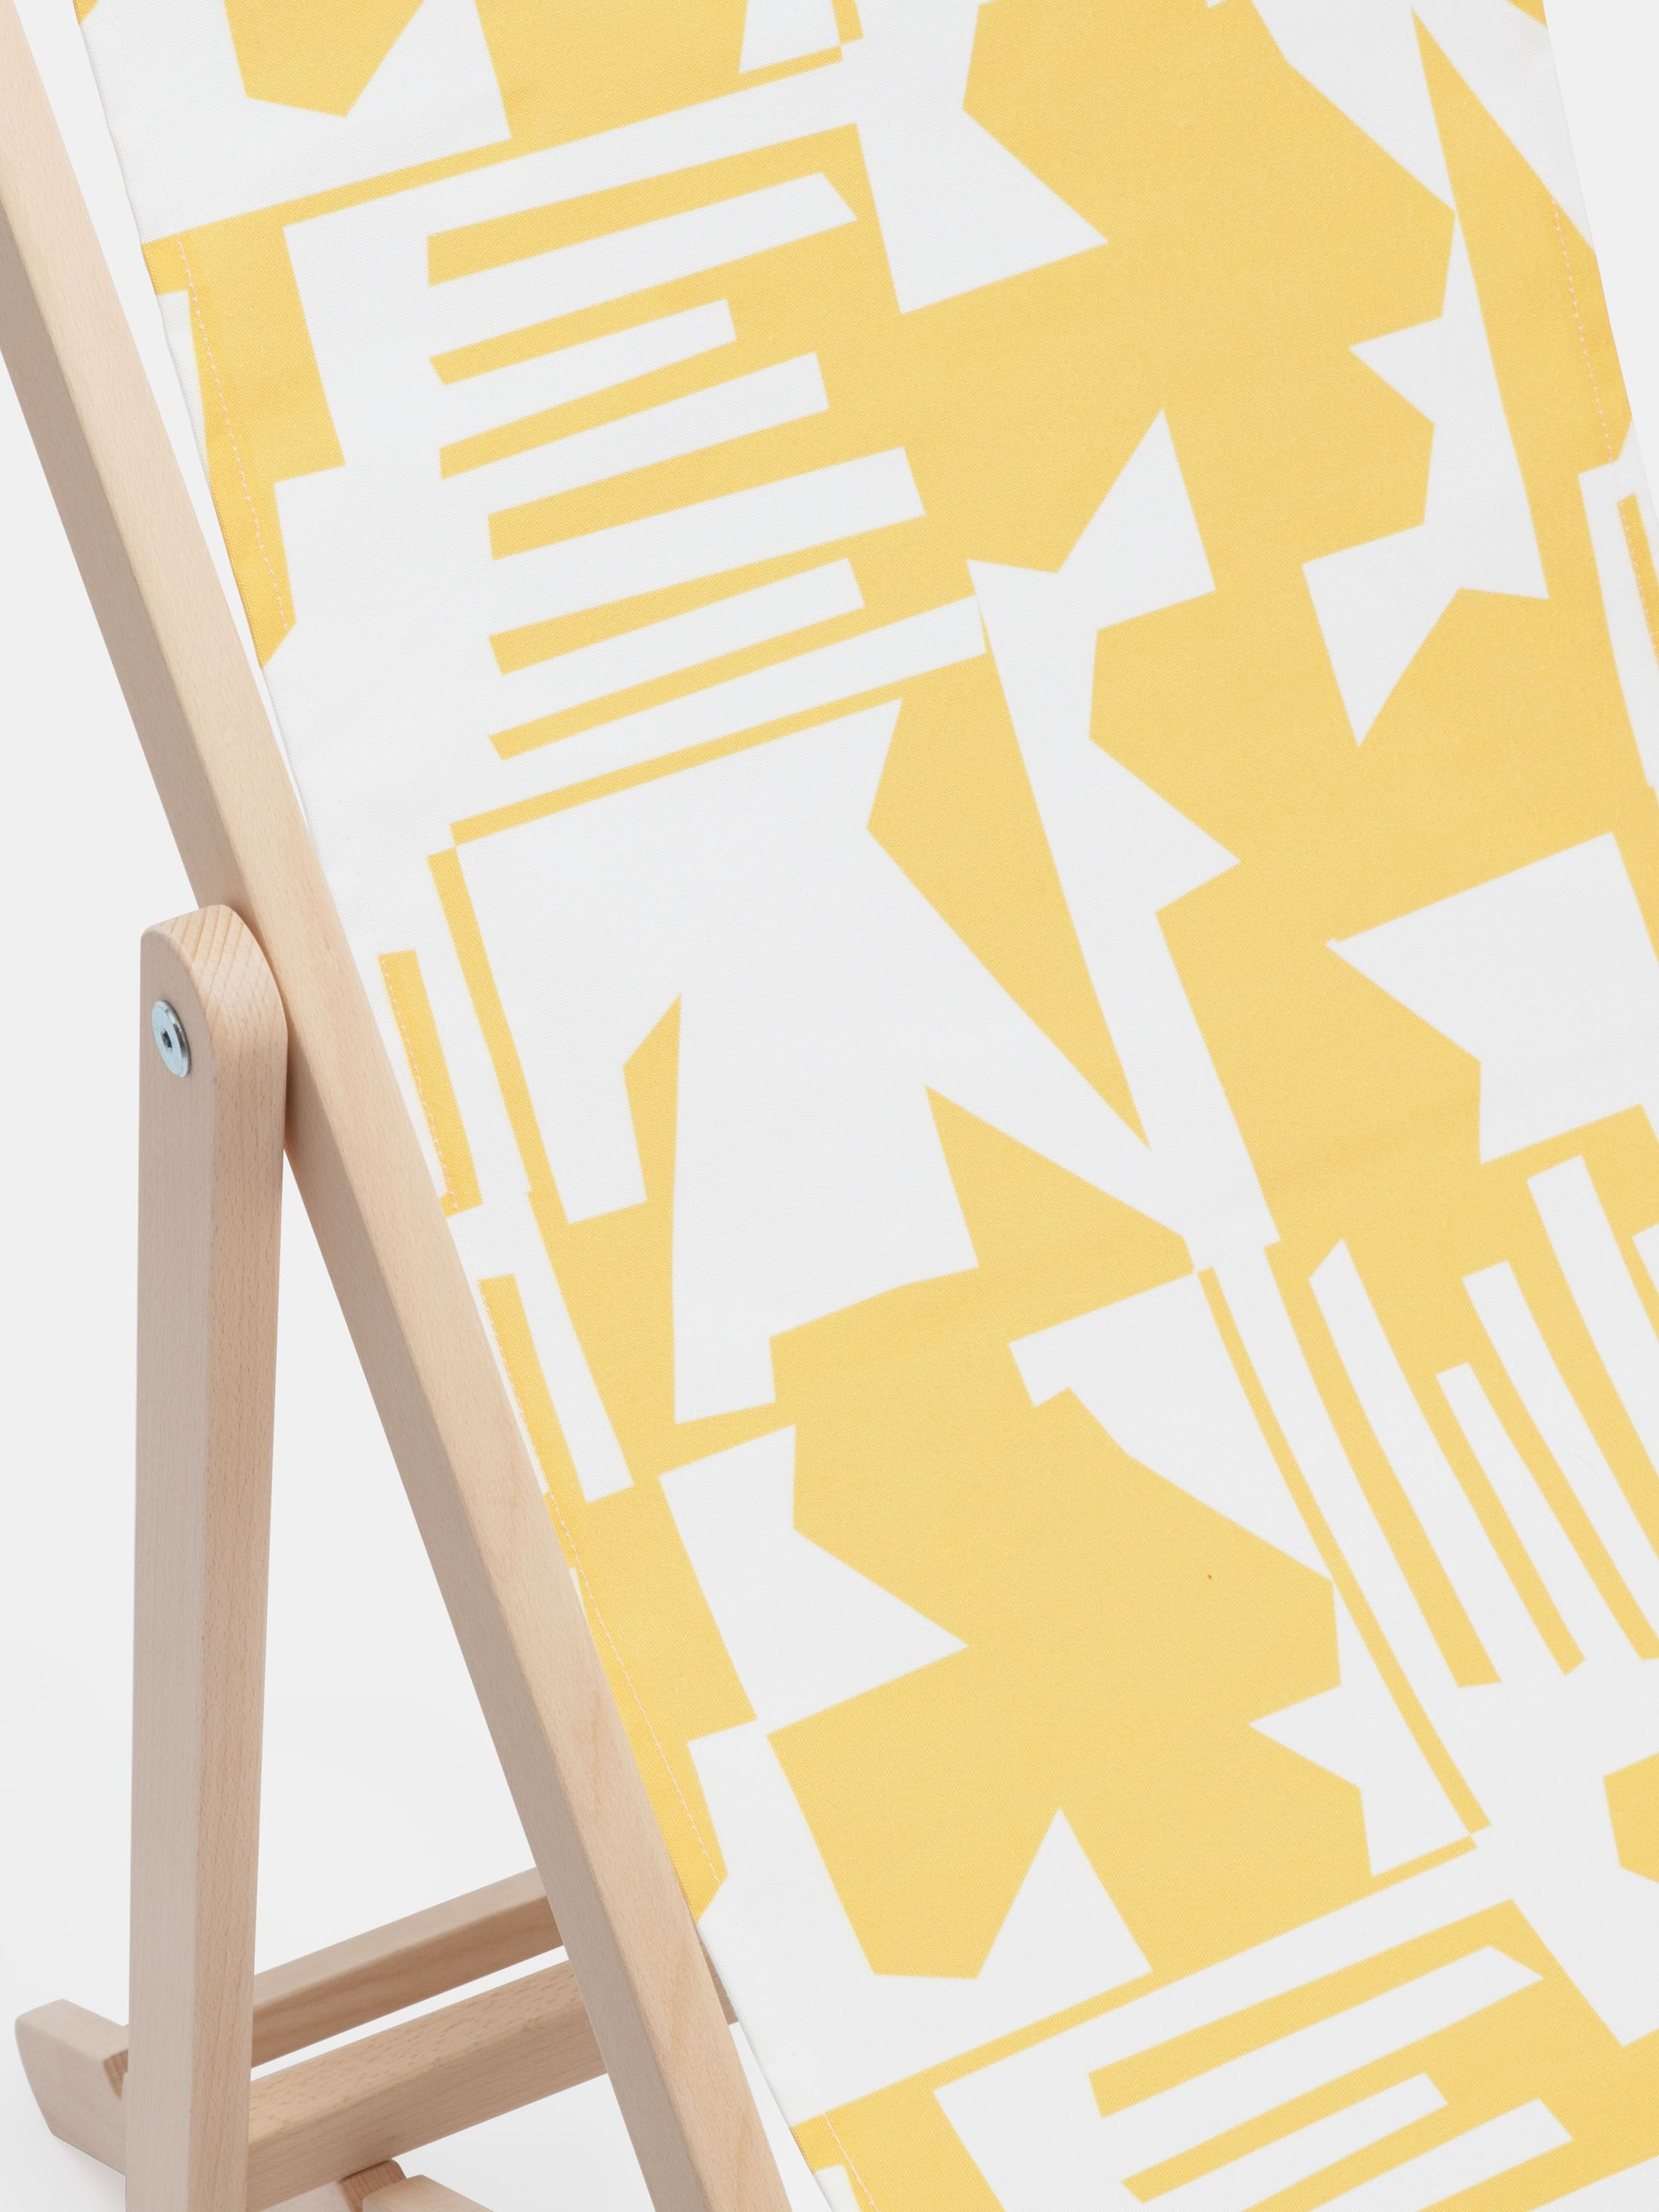 custom printed deckchairs